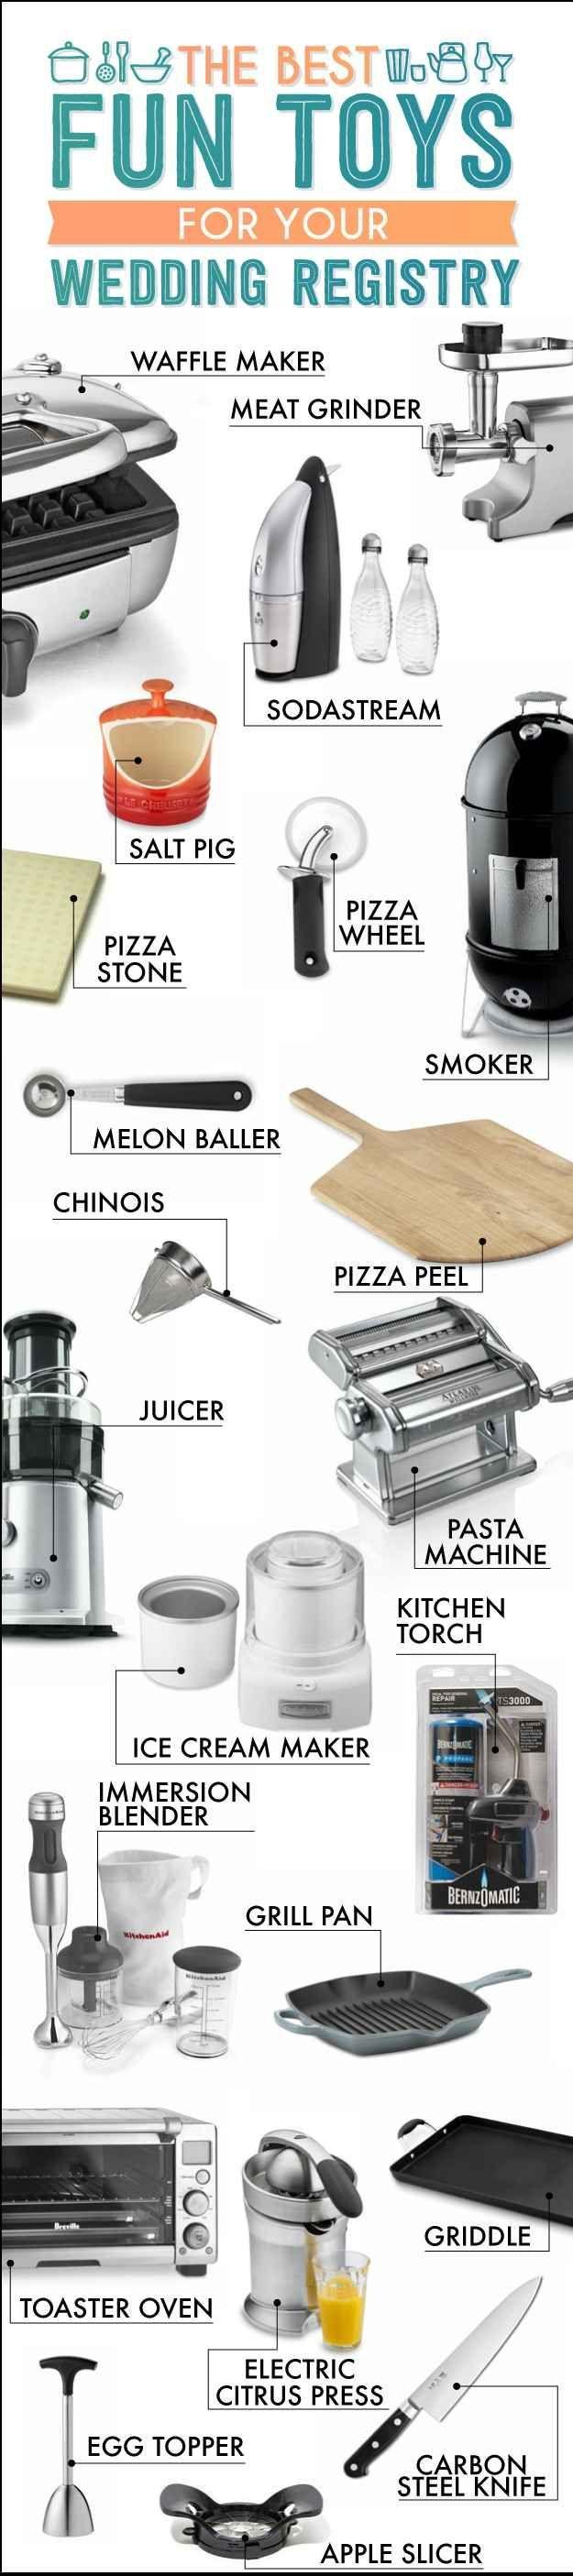 The Essential Wedding Registry Checklist For Your Kitchen. Wedding Registry Essentials || Aisle Perfect